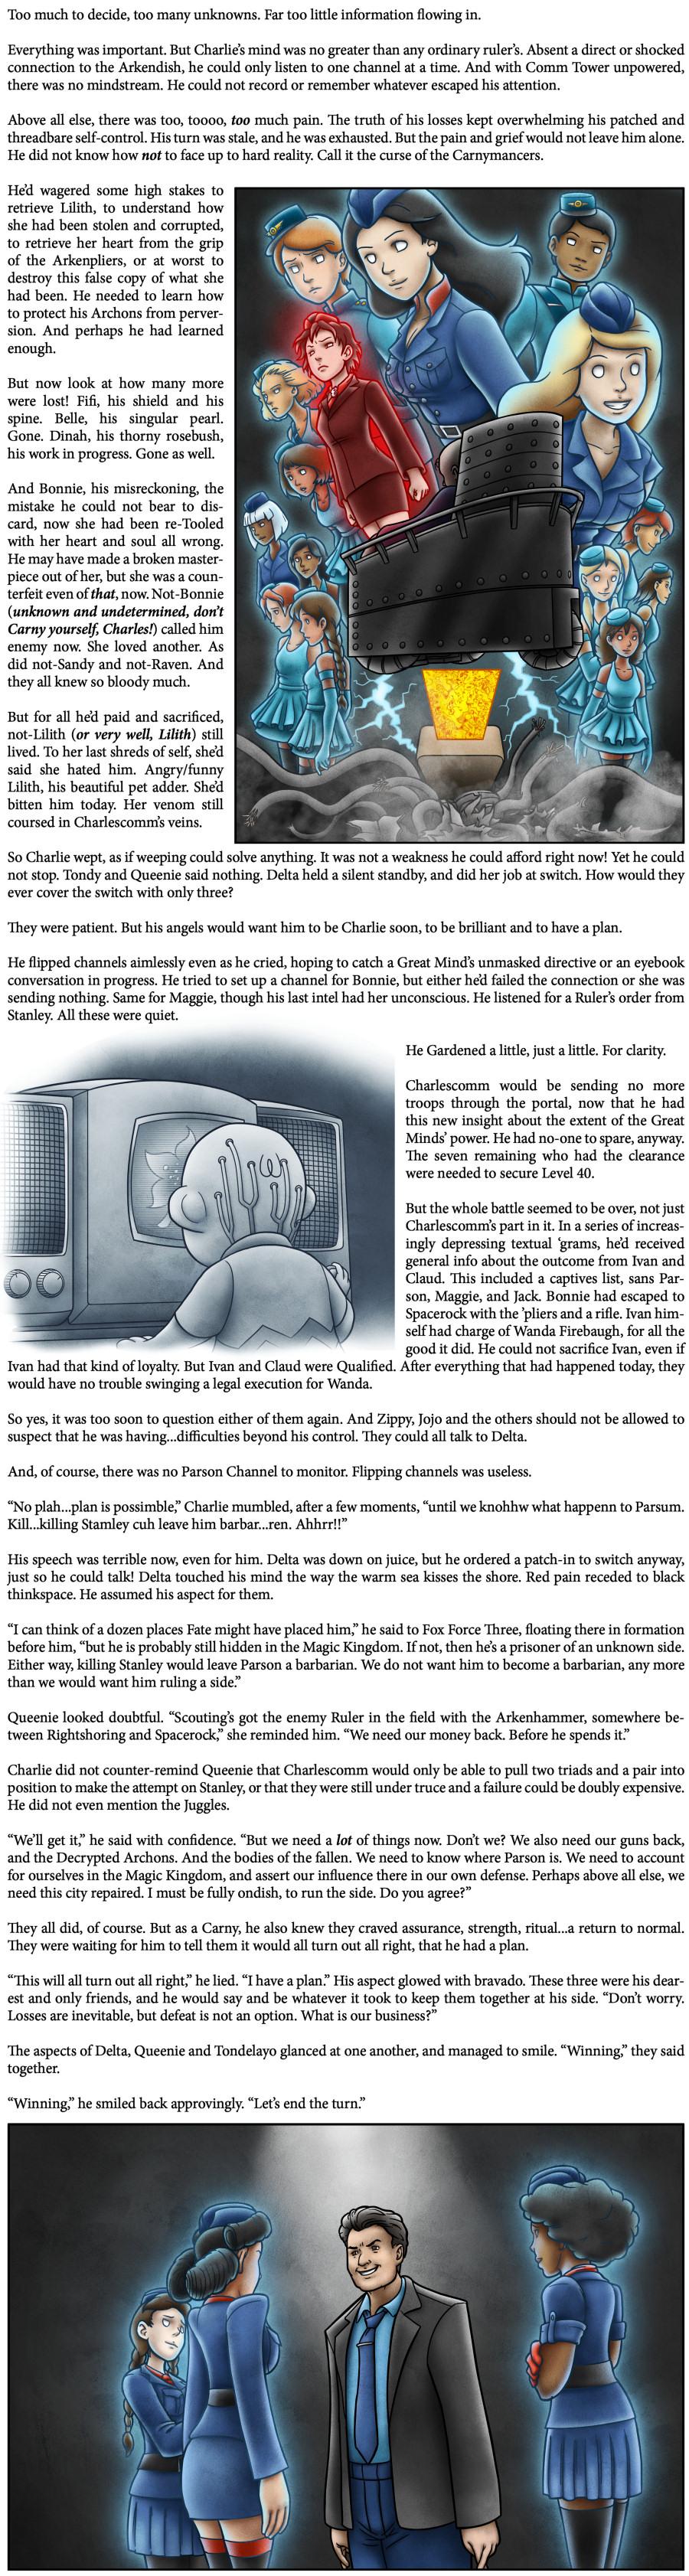 Comic - Book 3 - Page 144